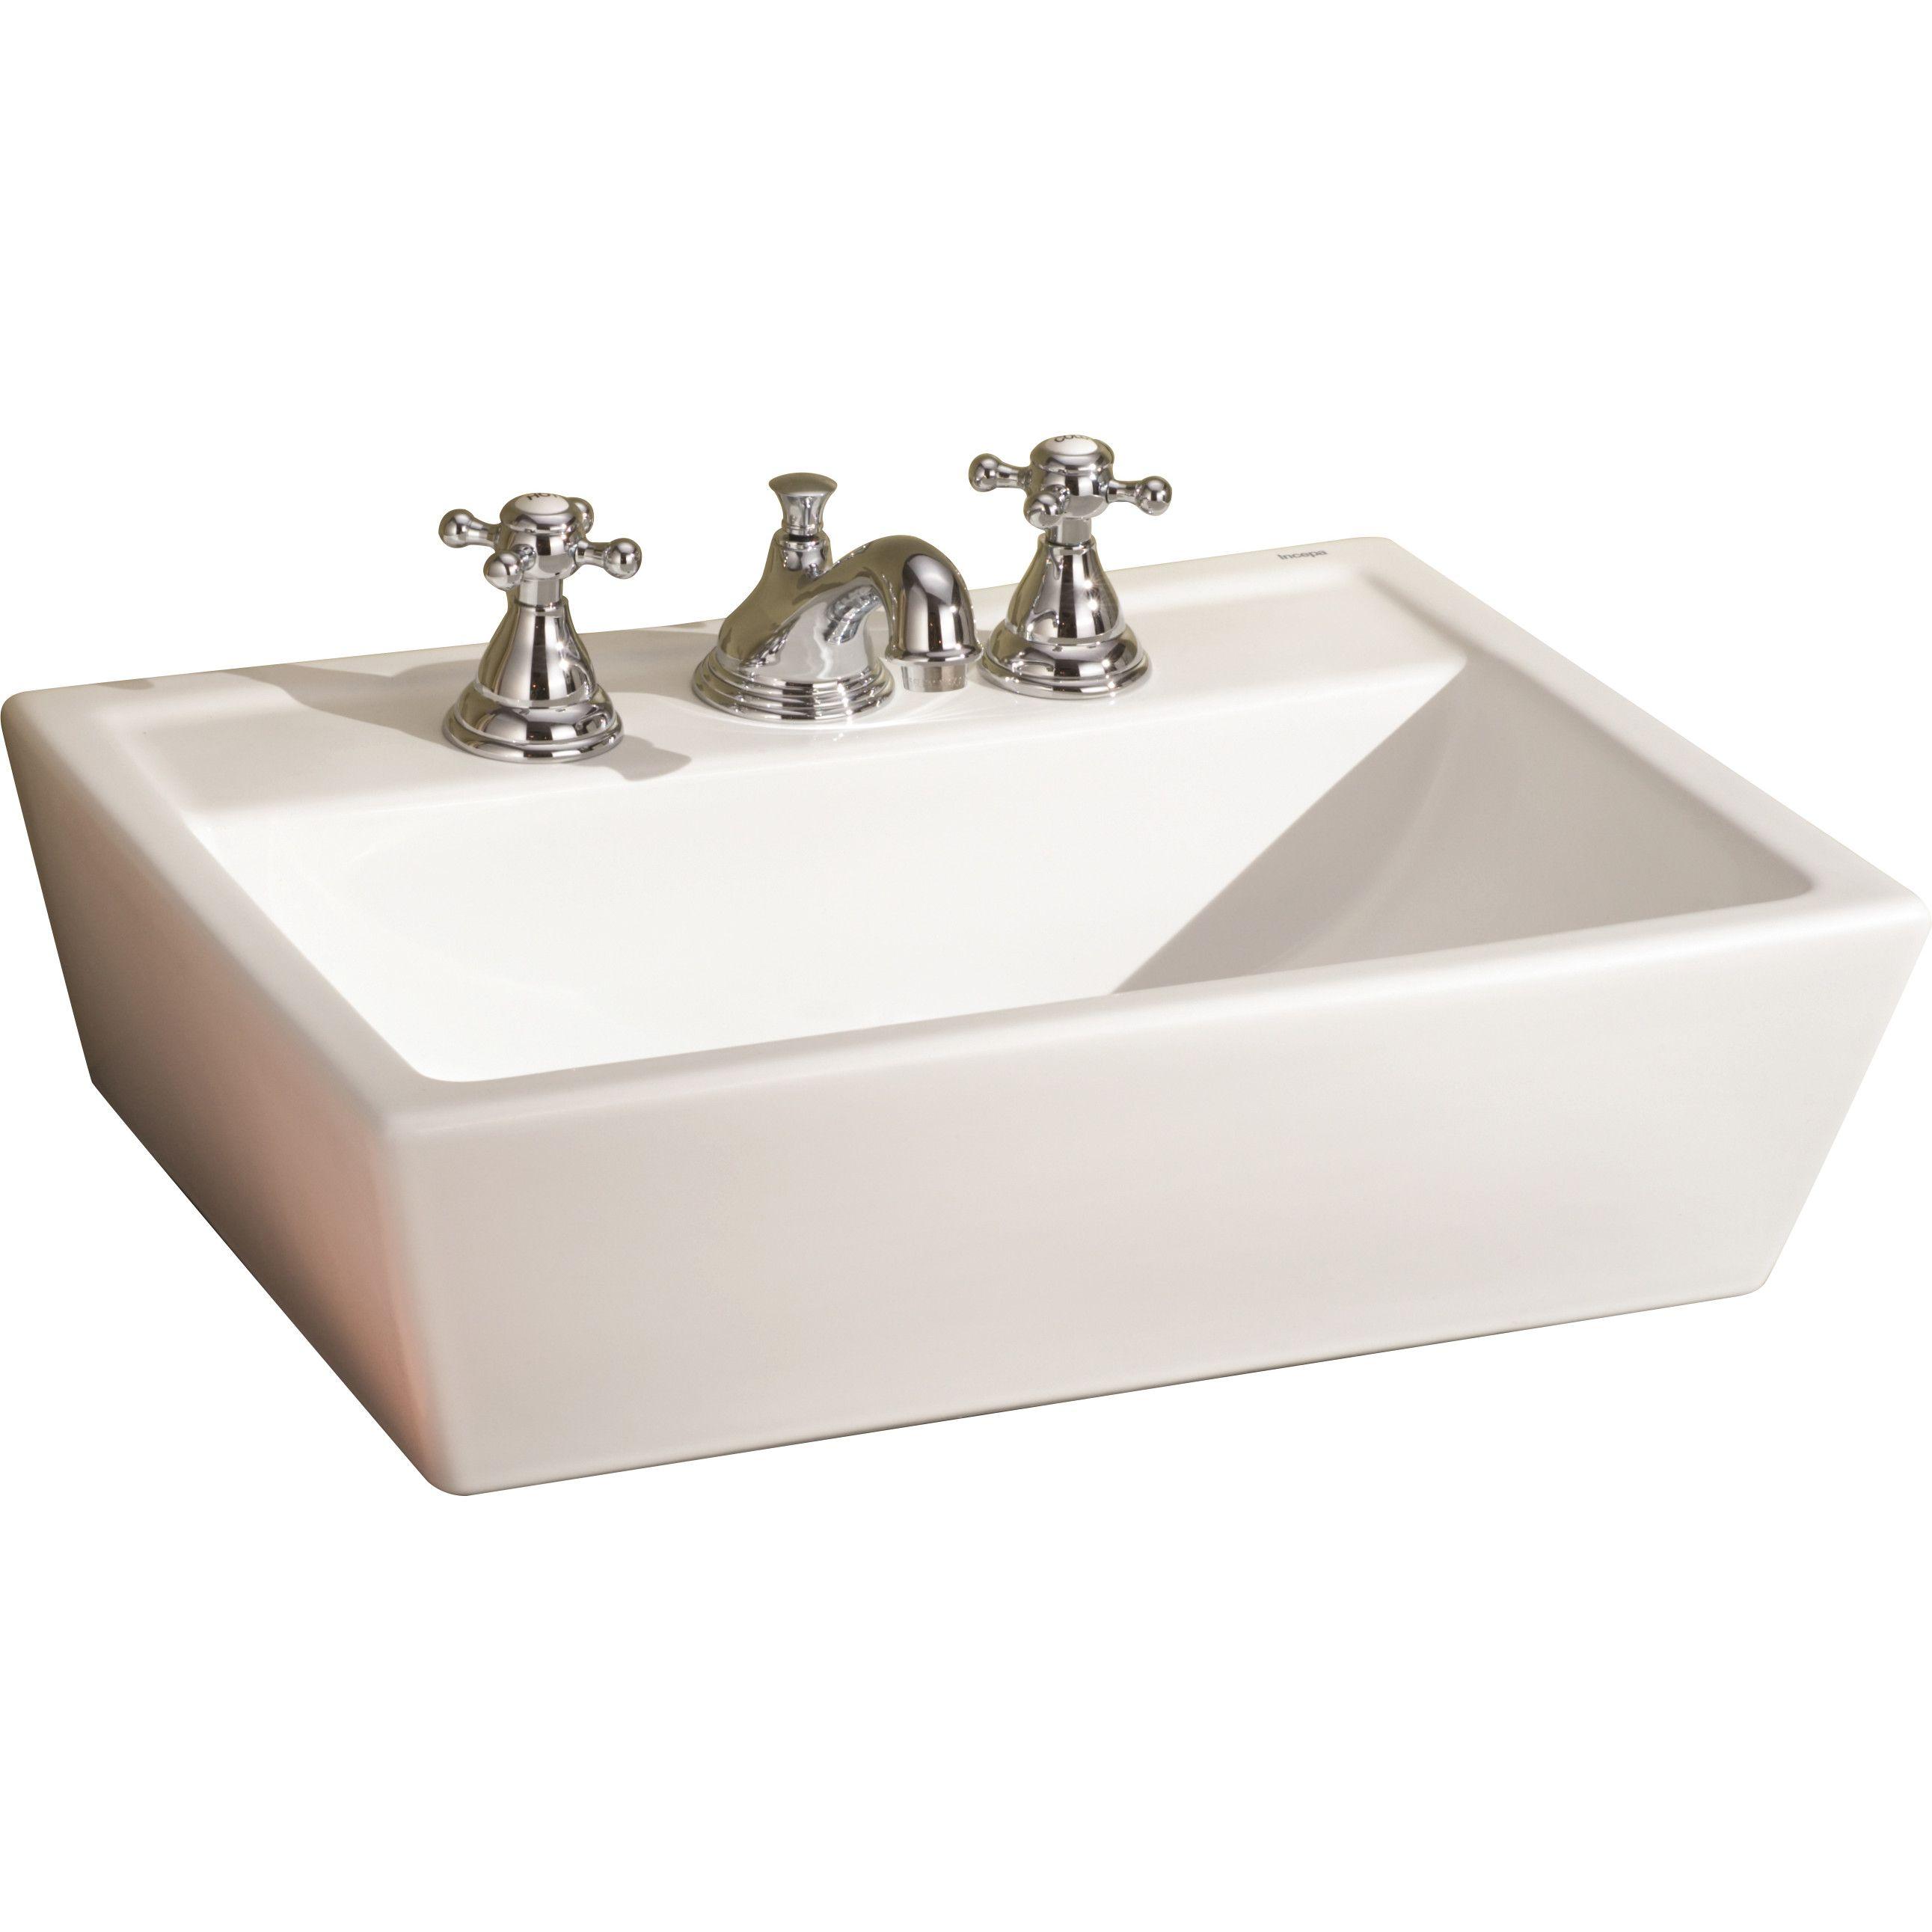 charming Wayfair Vessel Sinks Part - 3: Sentire Ceramic Rectangular Vessel Bathroom Sink